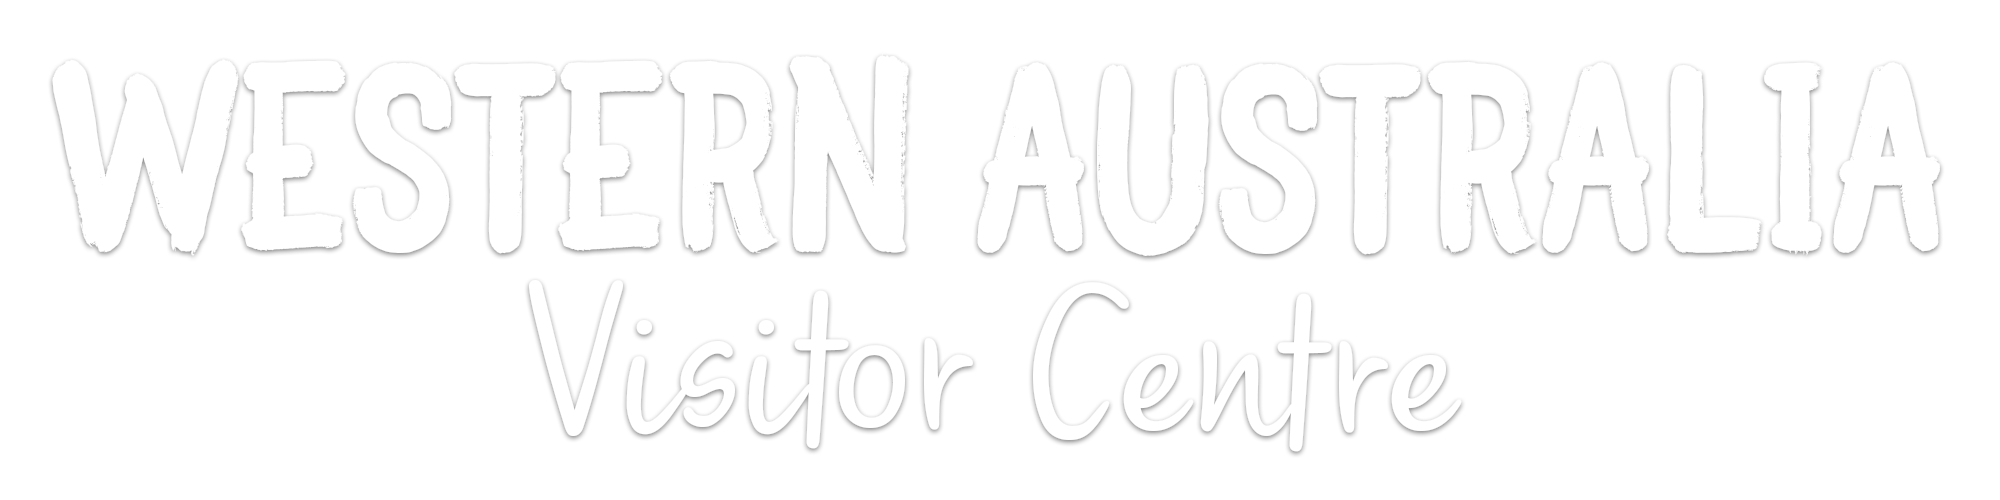 Western Australian Visitor Centre